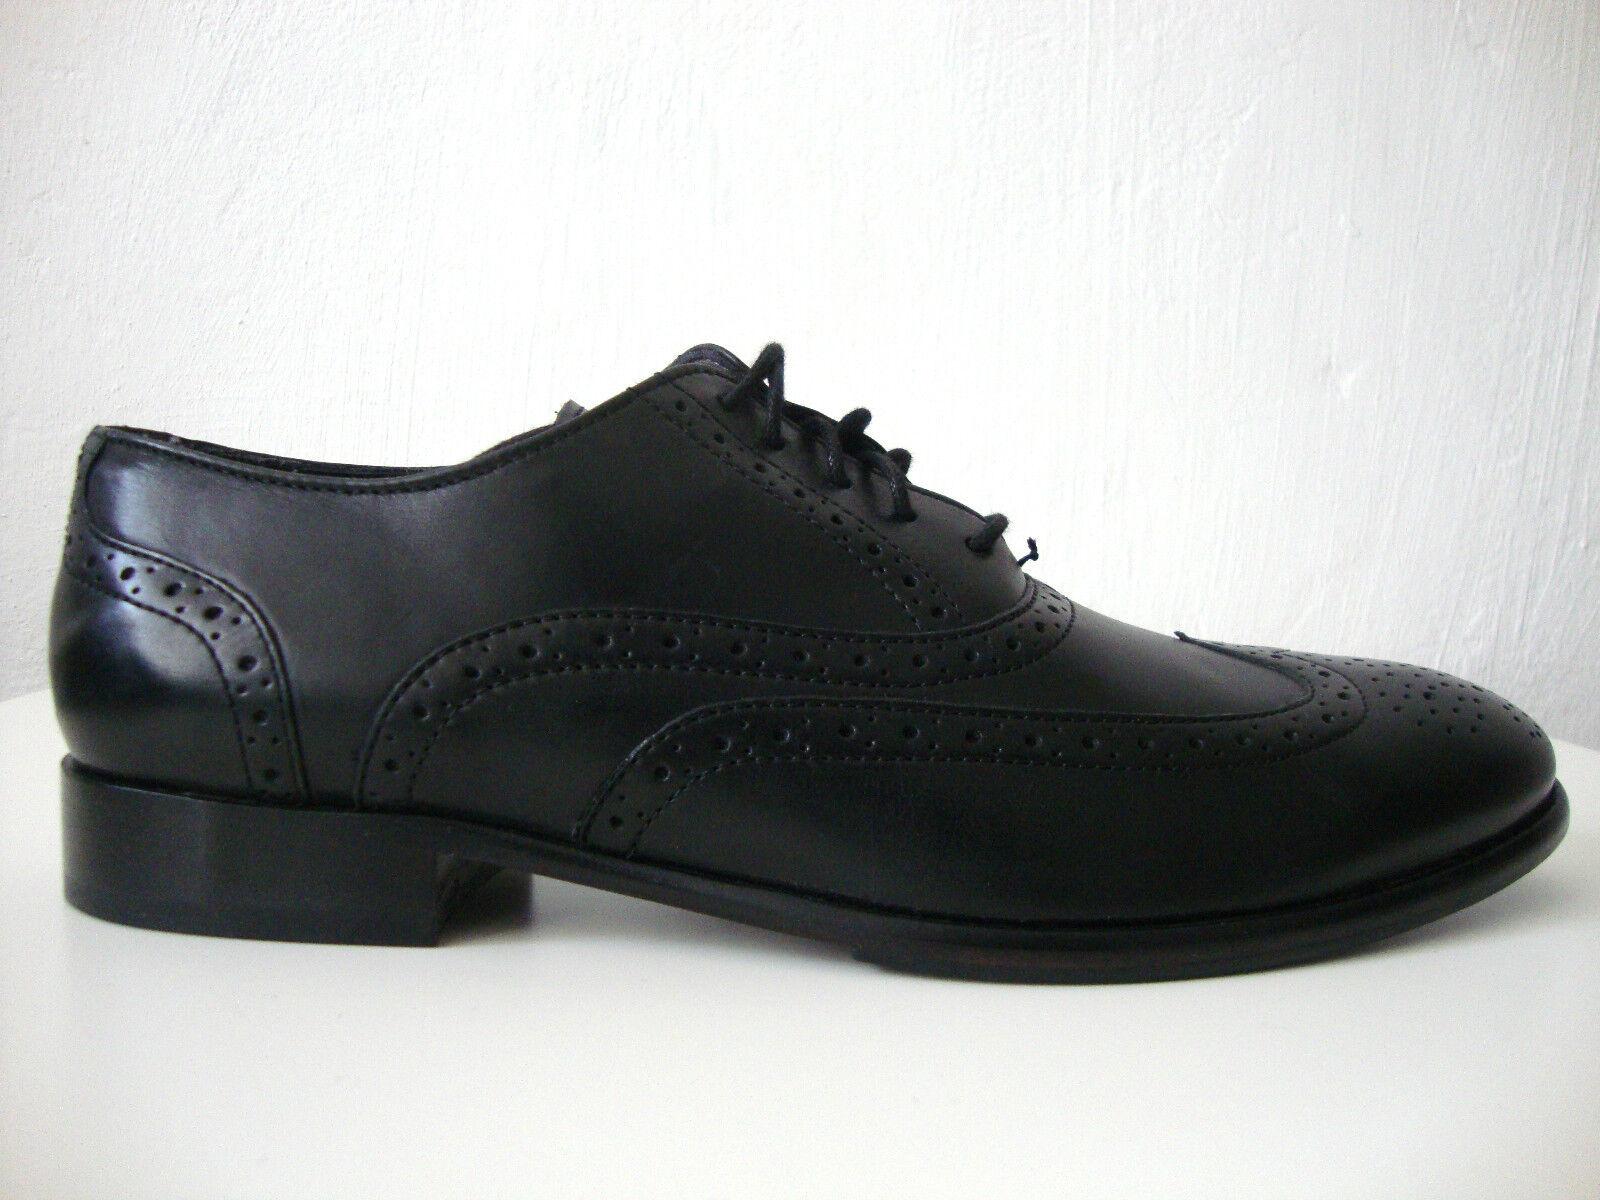 ESPRIT ESPRIT ESPRIT Herren Leder Business Schuhe Halbschuhe Leder Schuhe Gr.42 NEU mit ETIKET cfa0a9